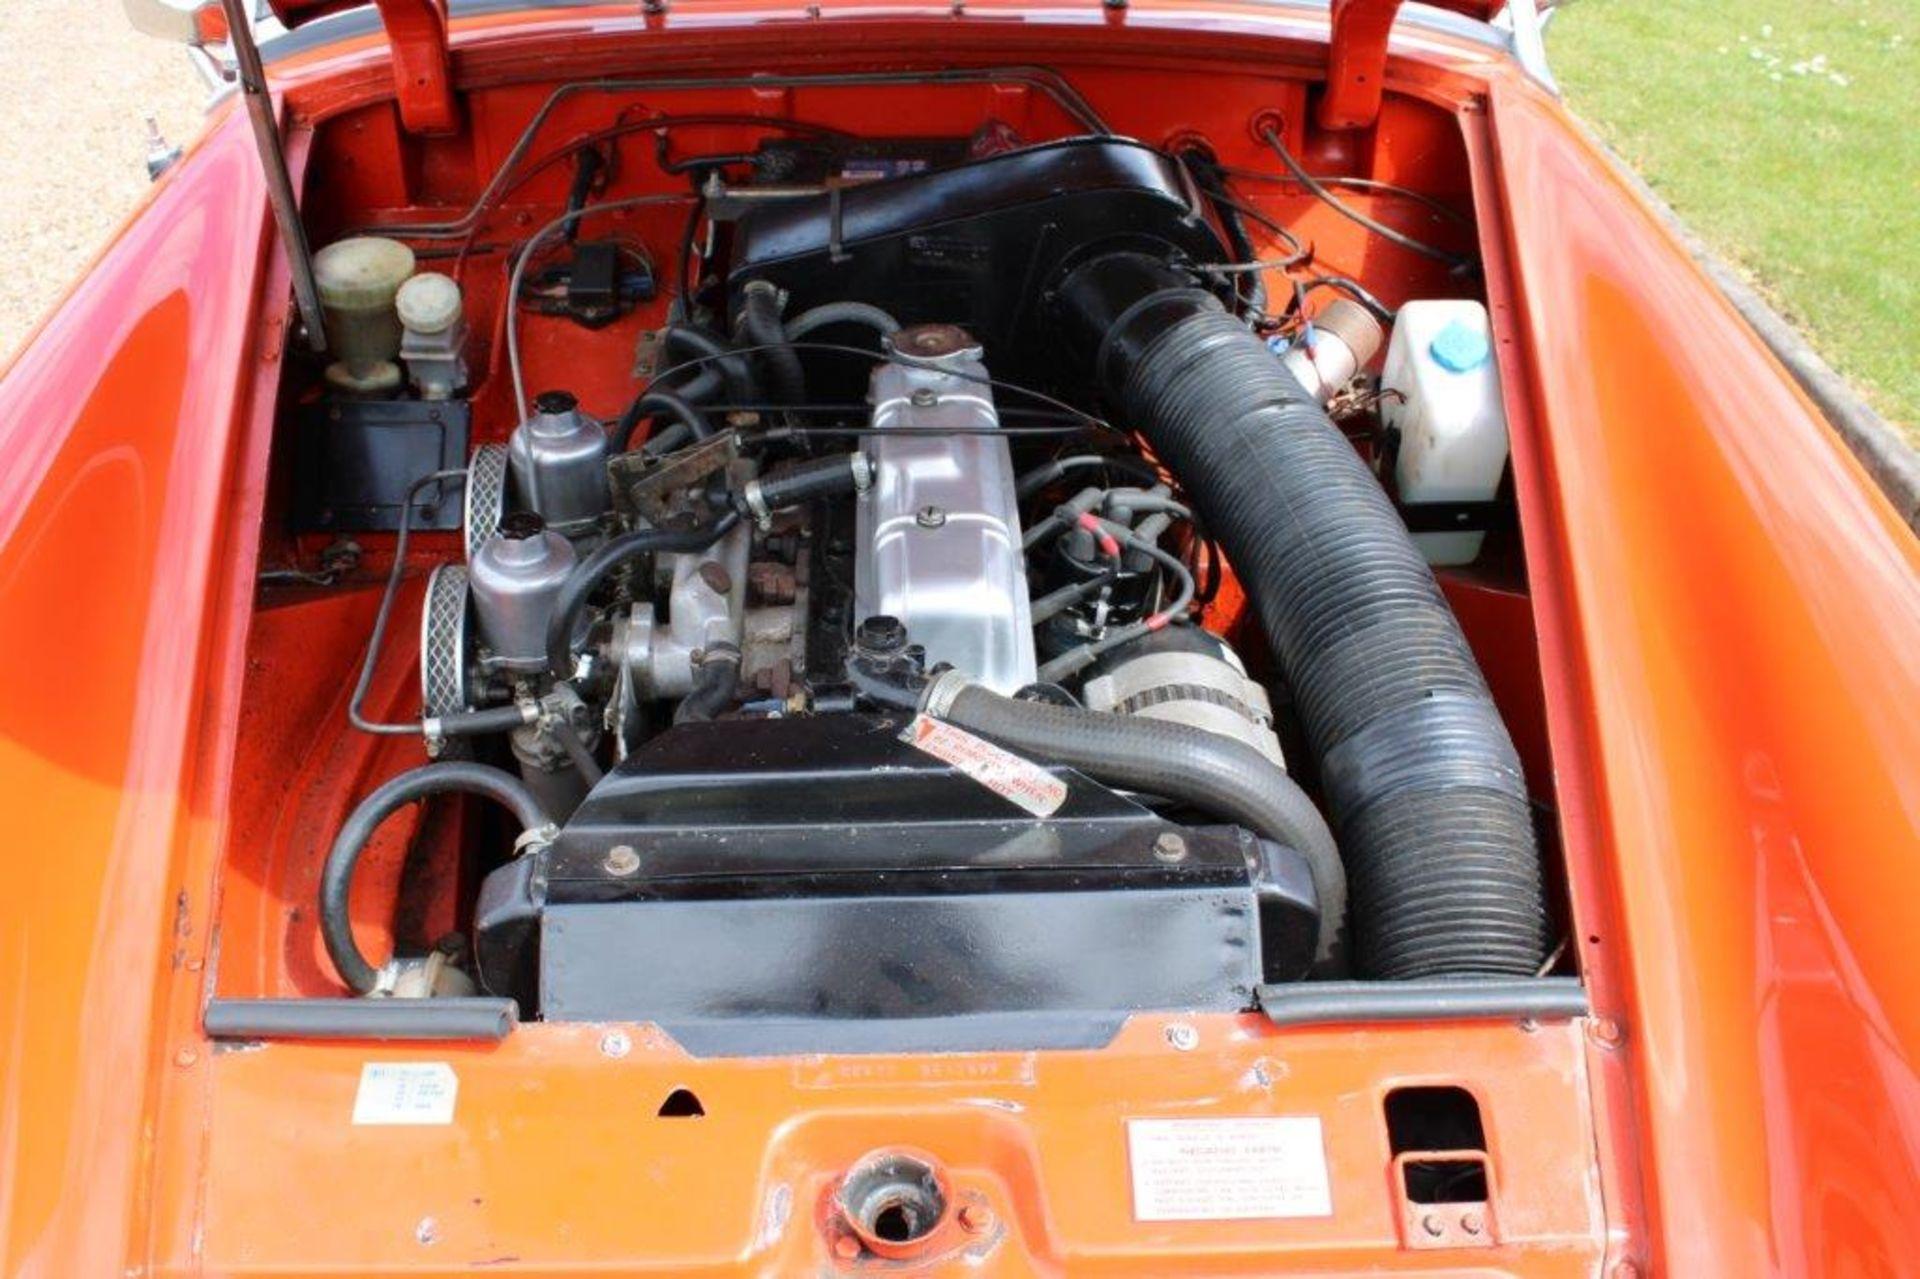 1979 MG Midget 1500 - Image 21 of 37